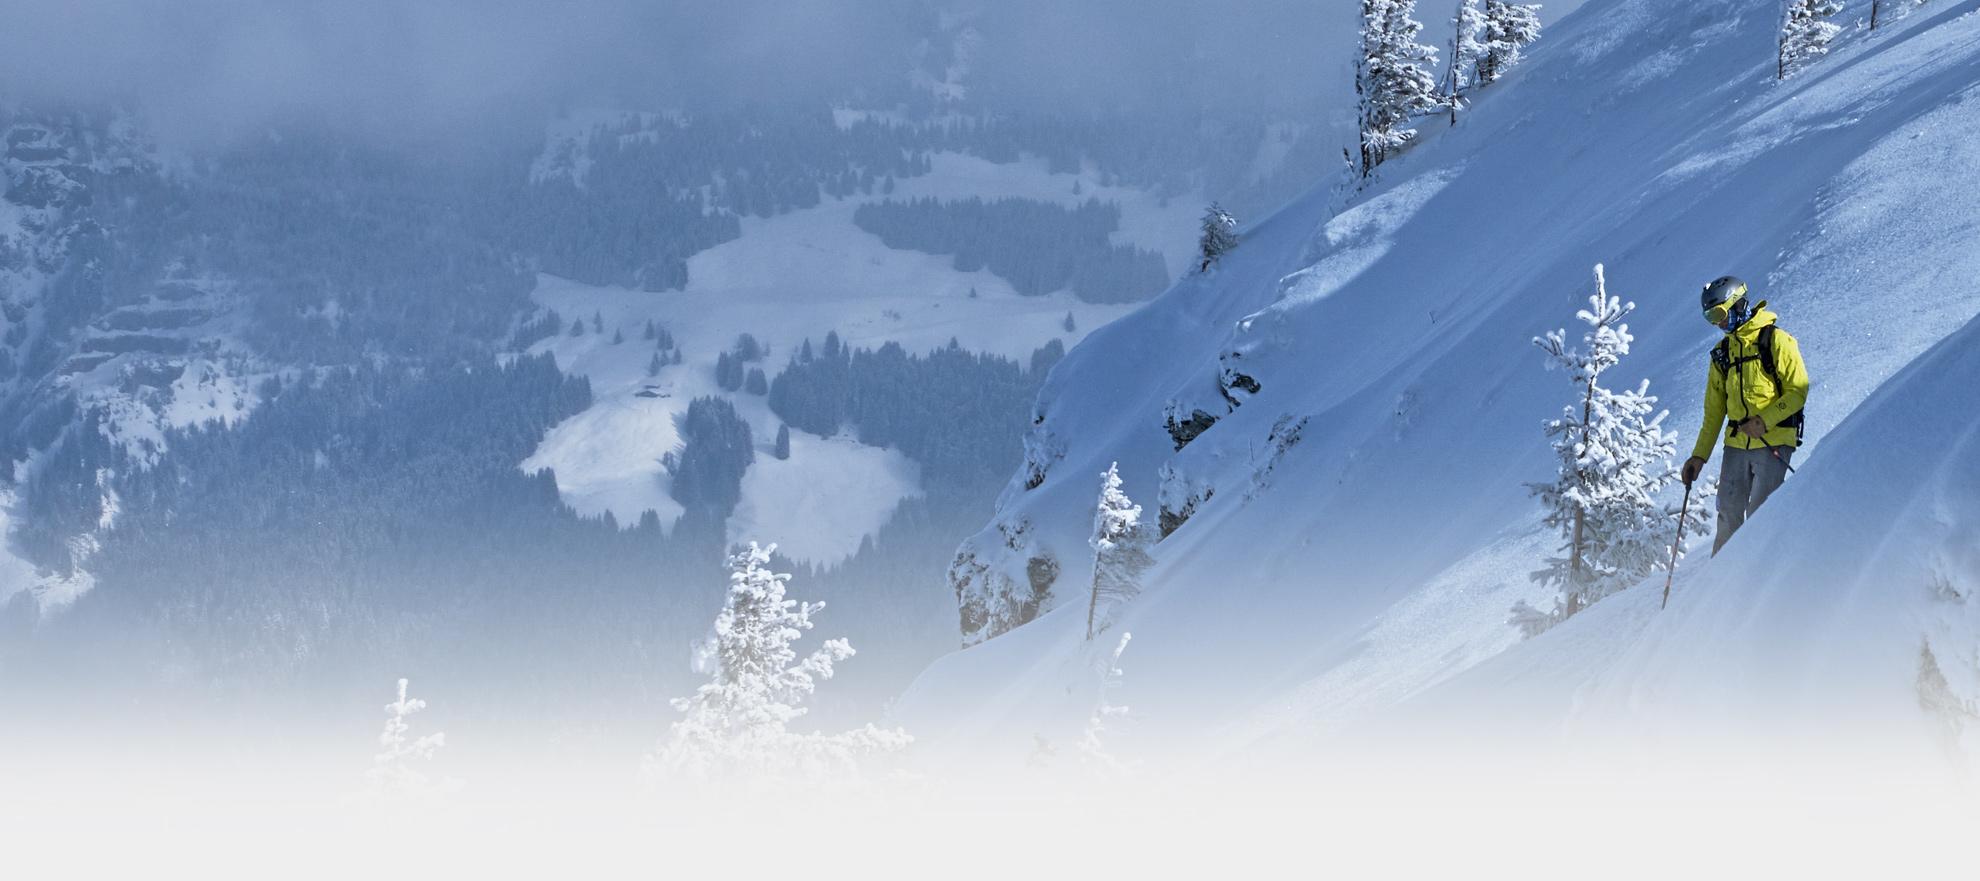 bergstolz main bg winter